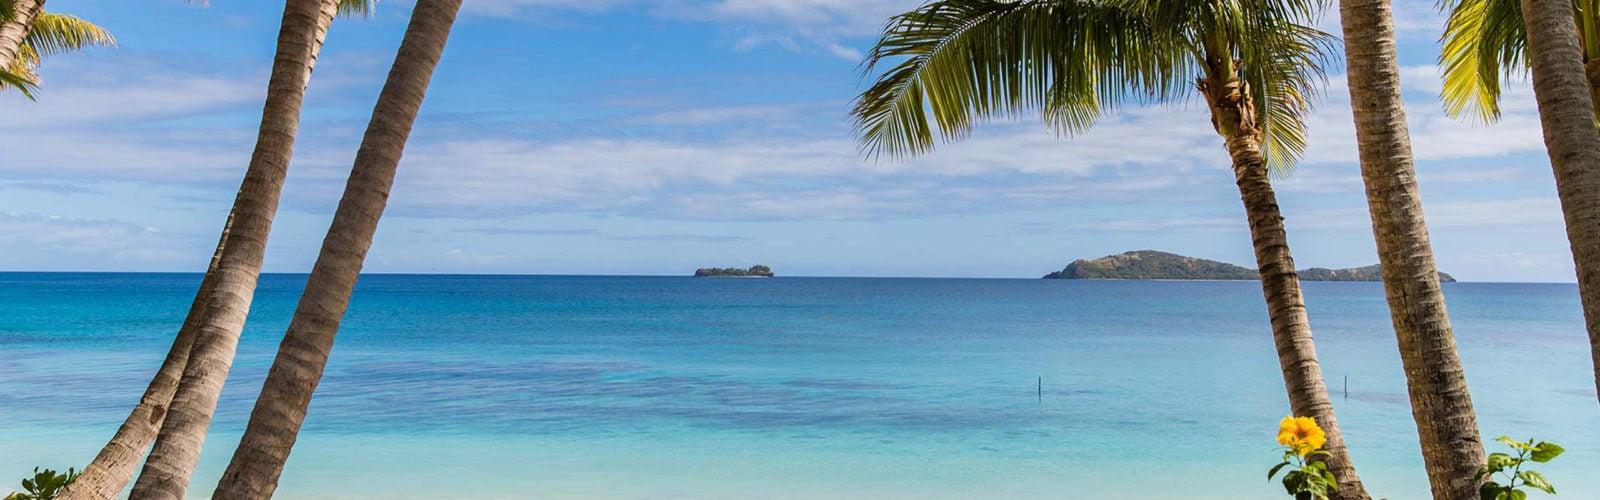 kokomo-private-island-beach